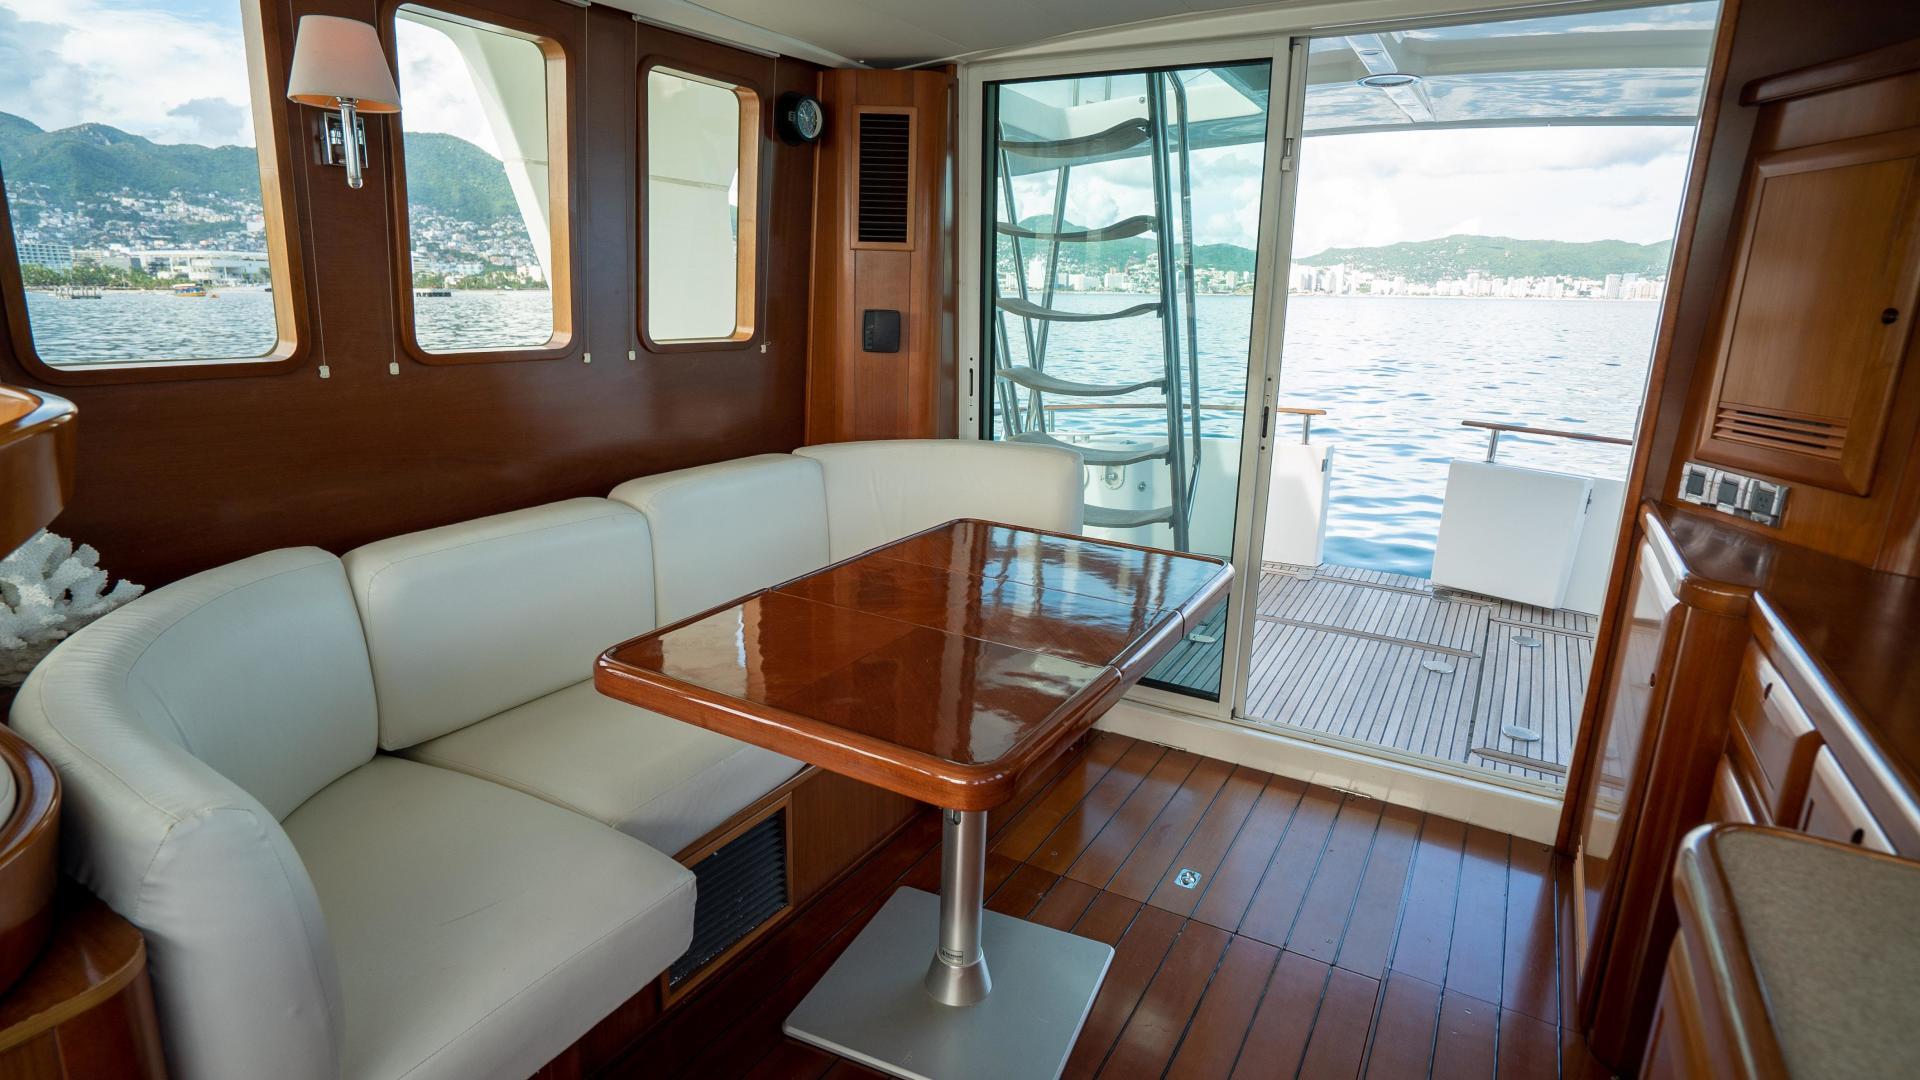 Beneteau-Swift Trawler 2008-Amadeus Acapulco-Mexico-1487061 | Thumbnail